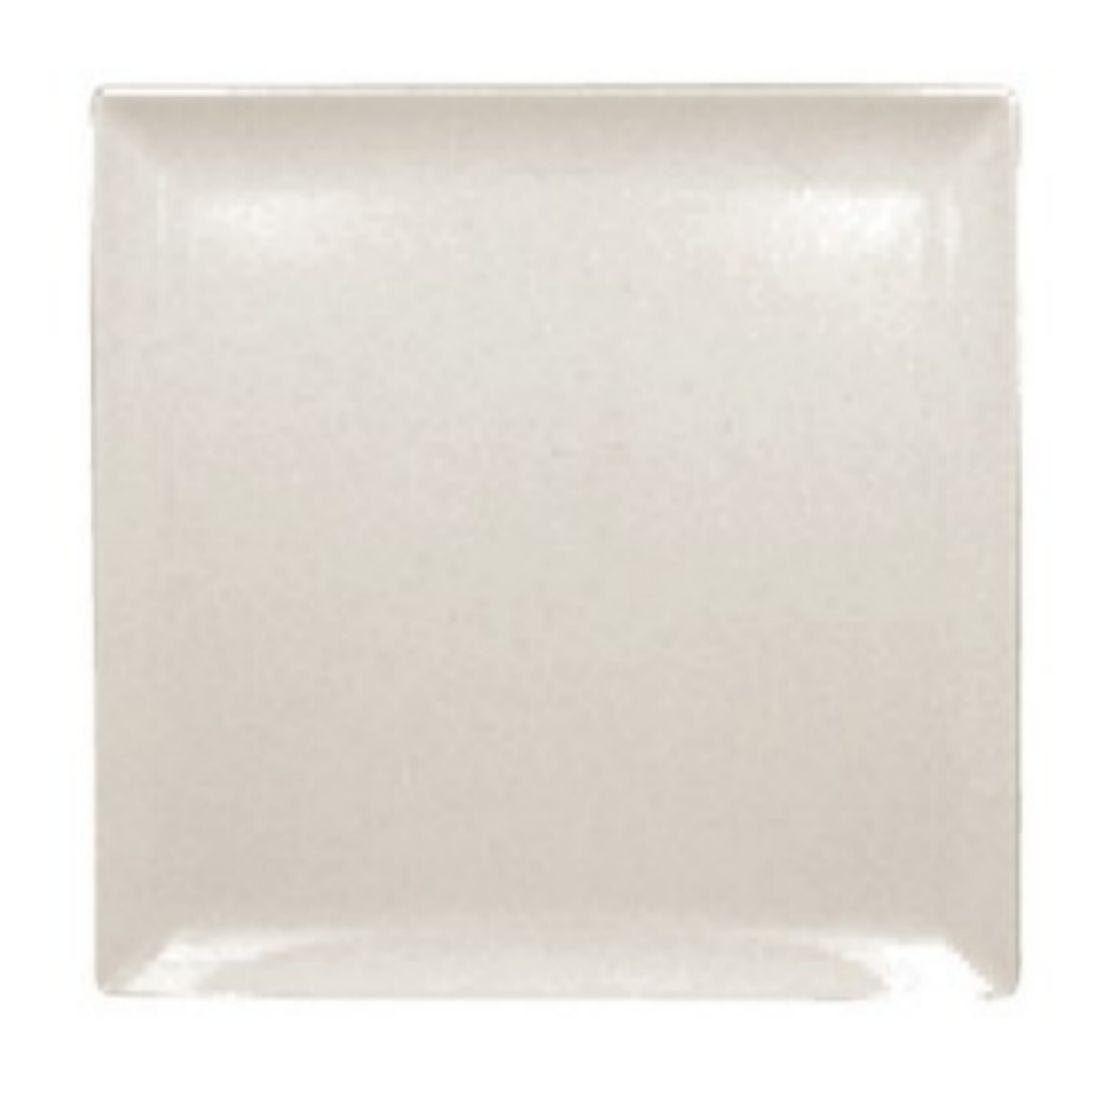 Nano talíř mělký - čtvercový 24,5 cm